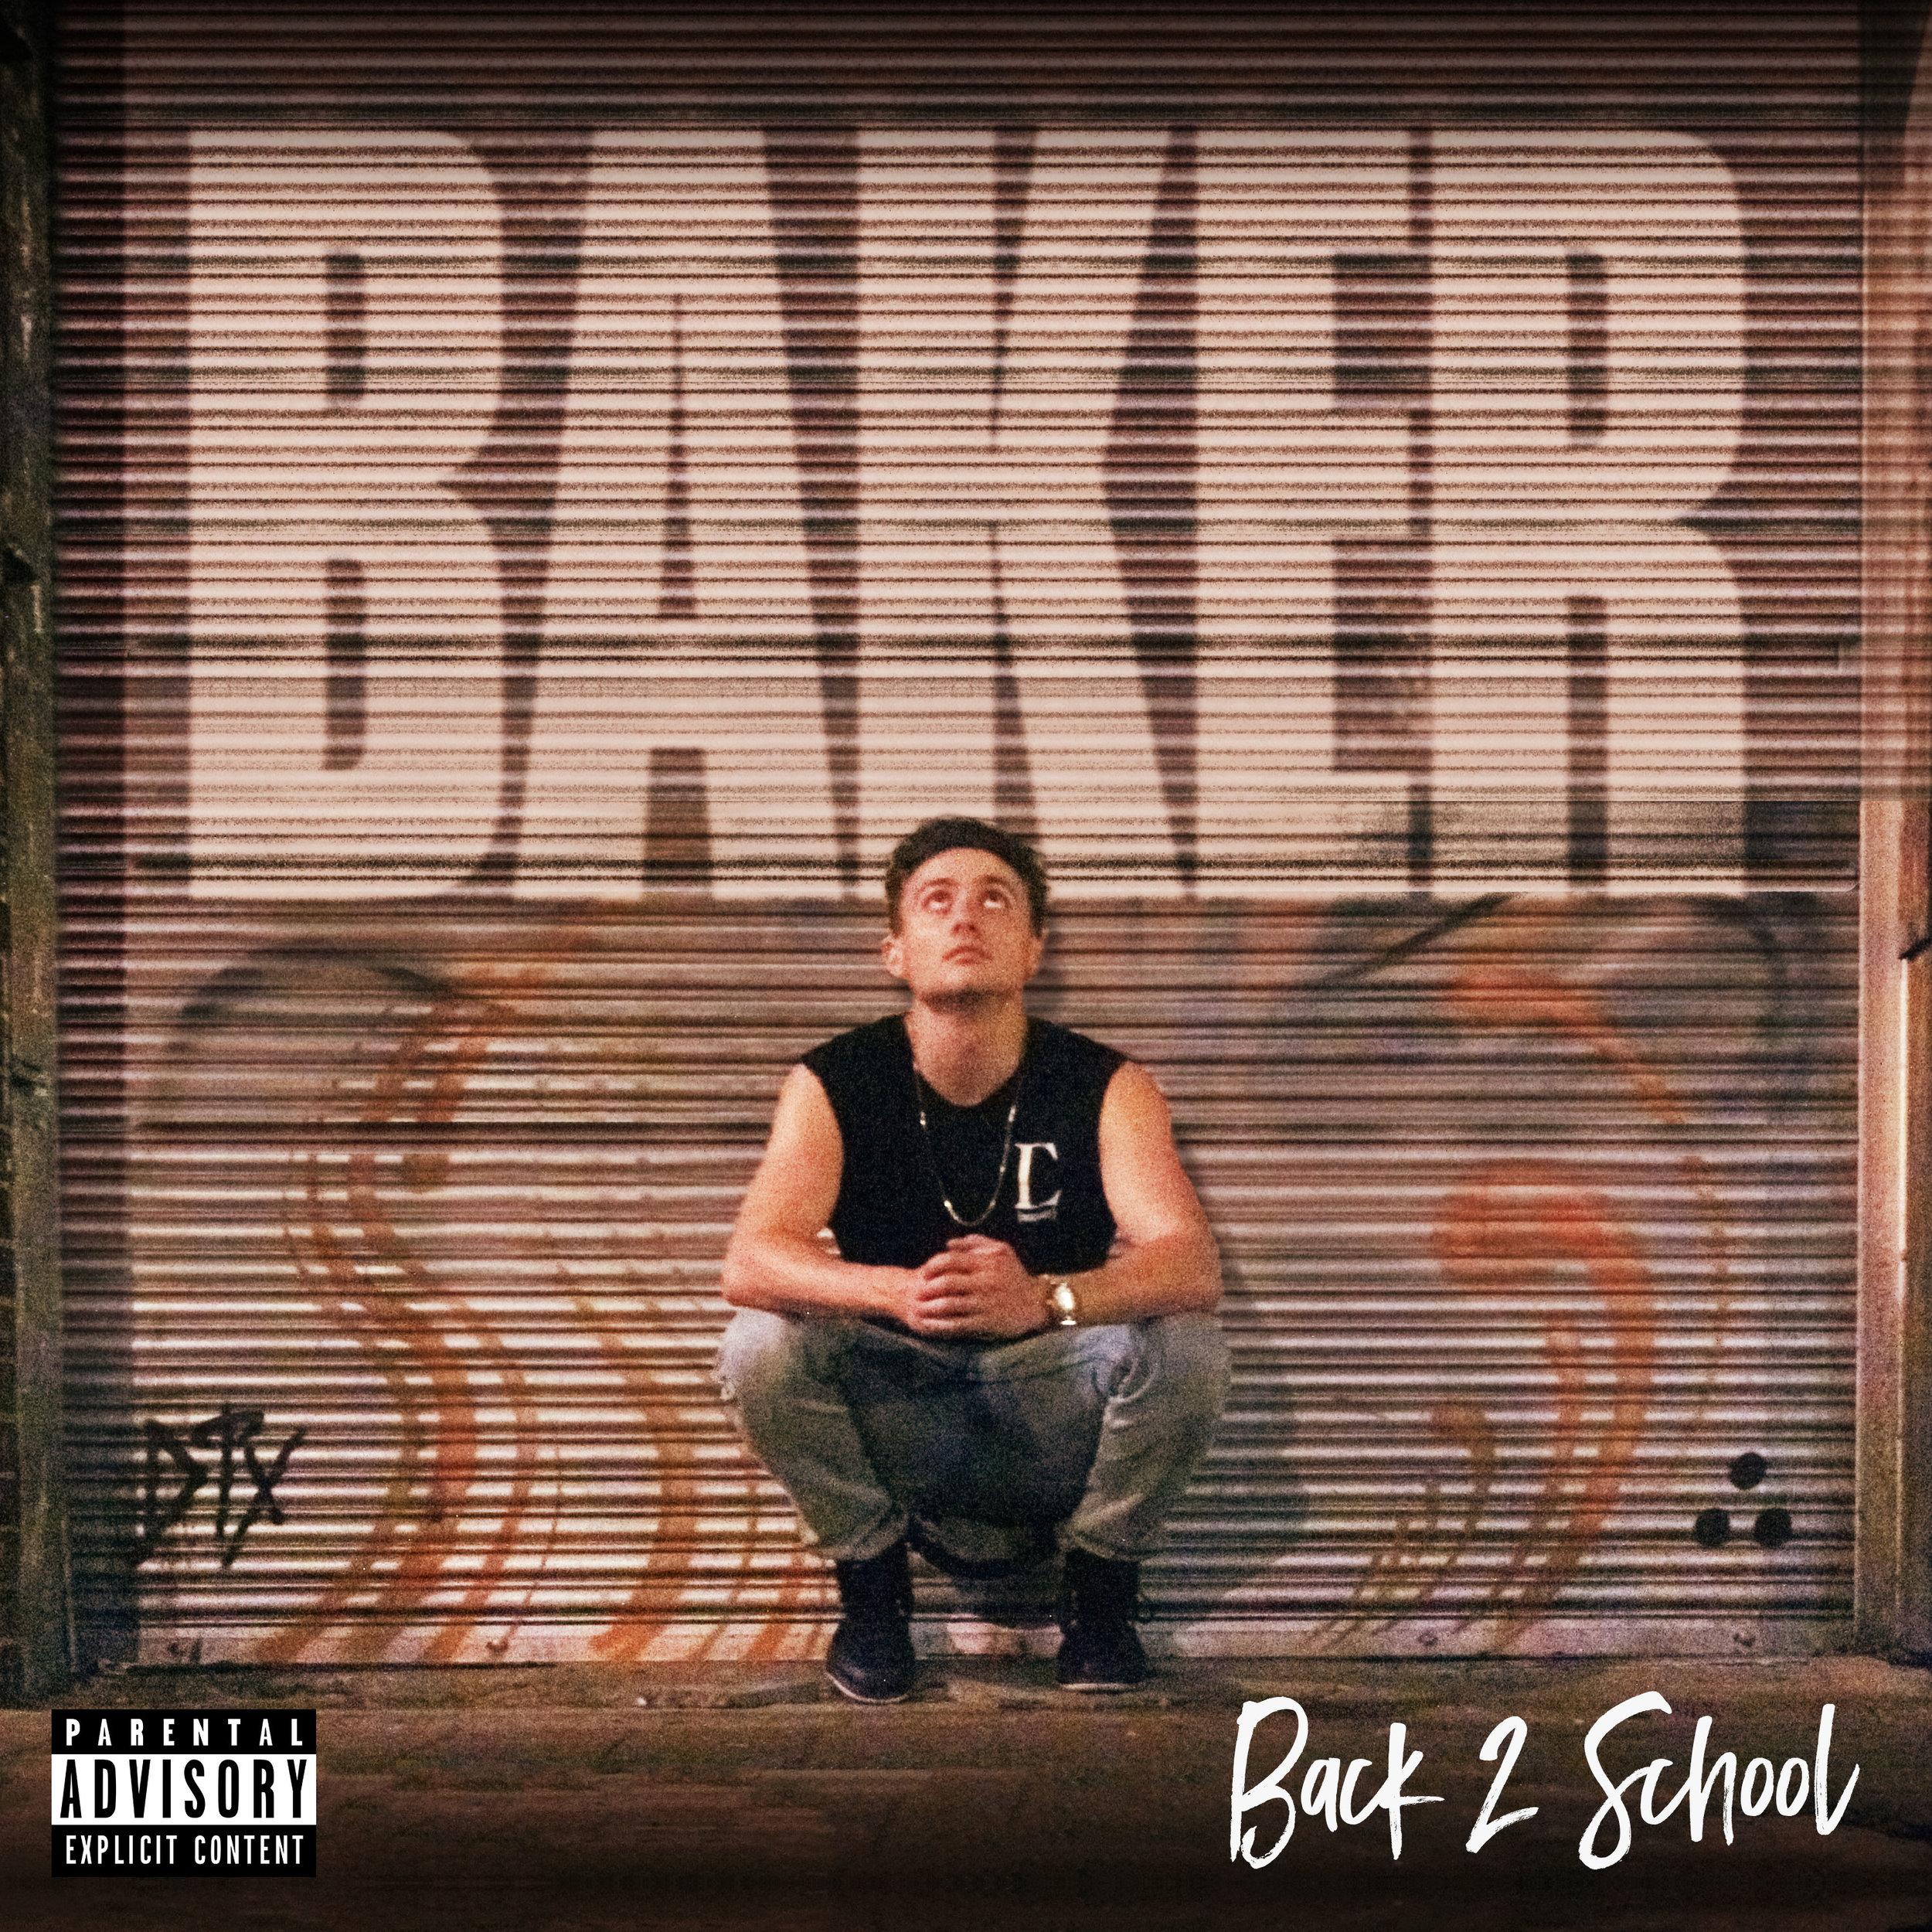 BACK 2 SCHOOL -